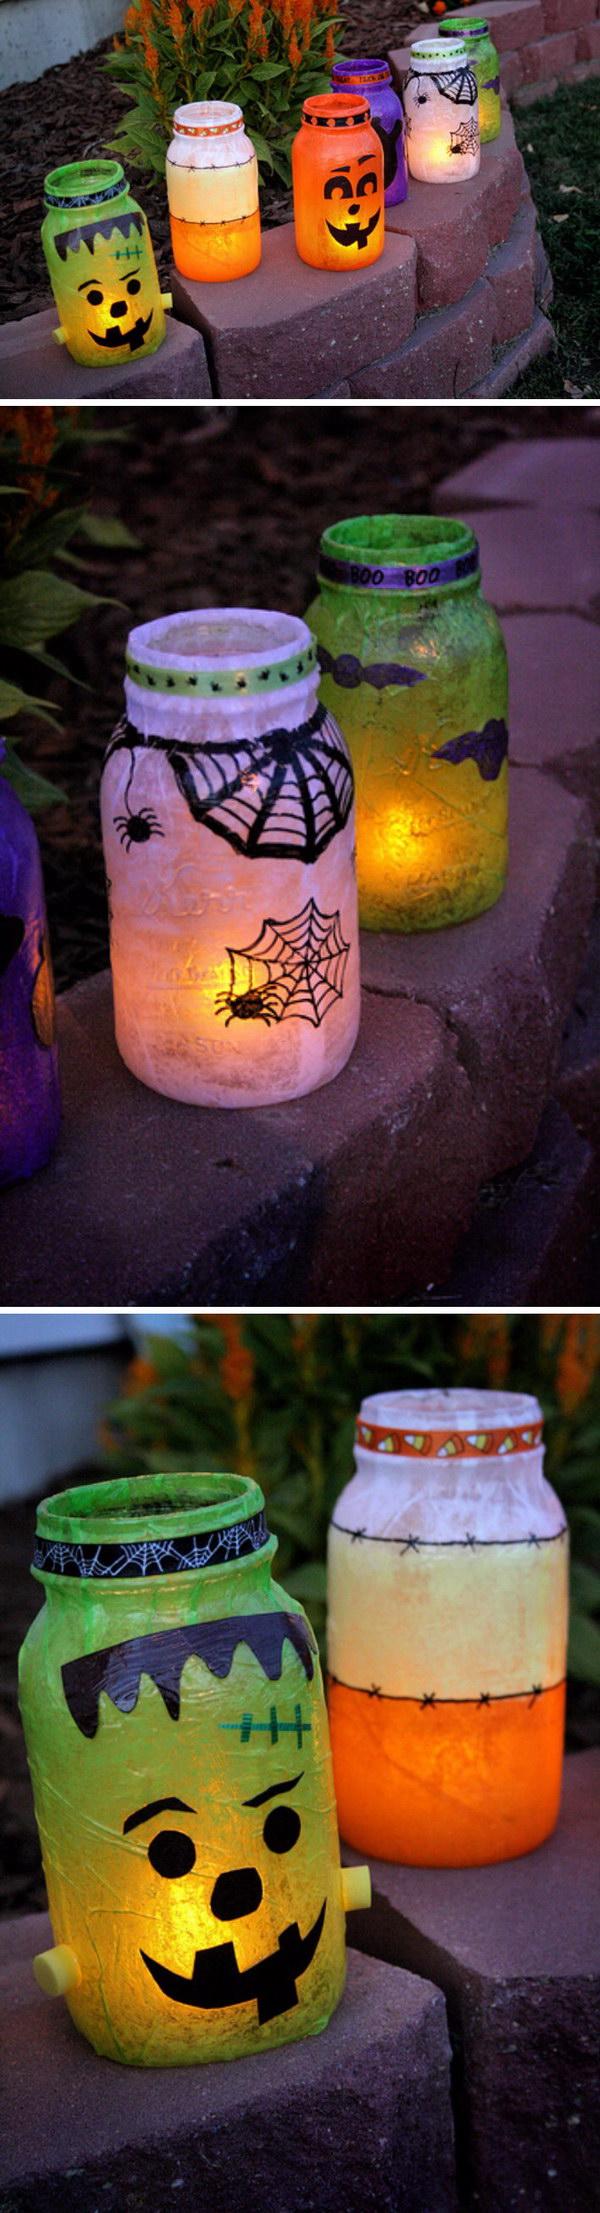 Cute Halloween Lanterns.